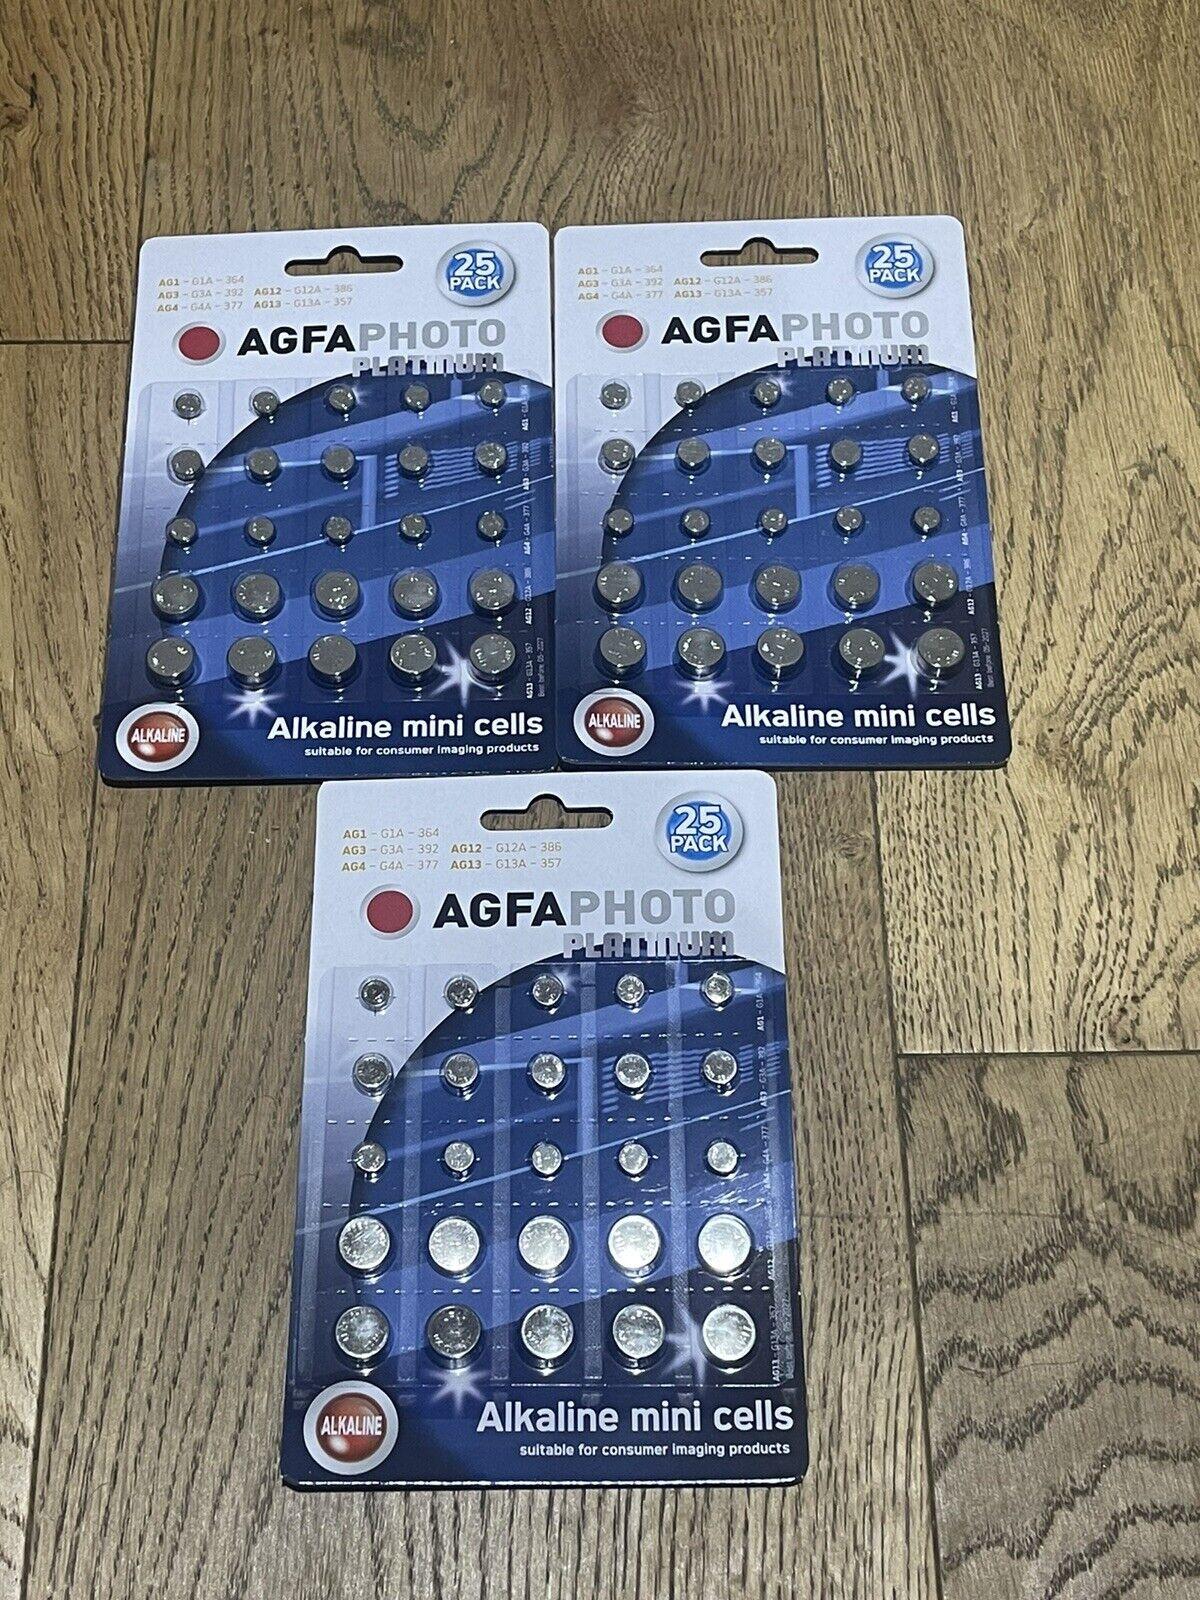 3 X AGFA Alkaline Mini Cell Batteries 25pk for various small appliances (3packs)